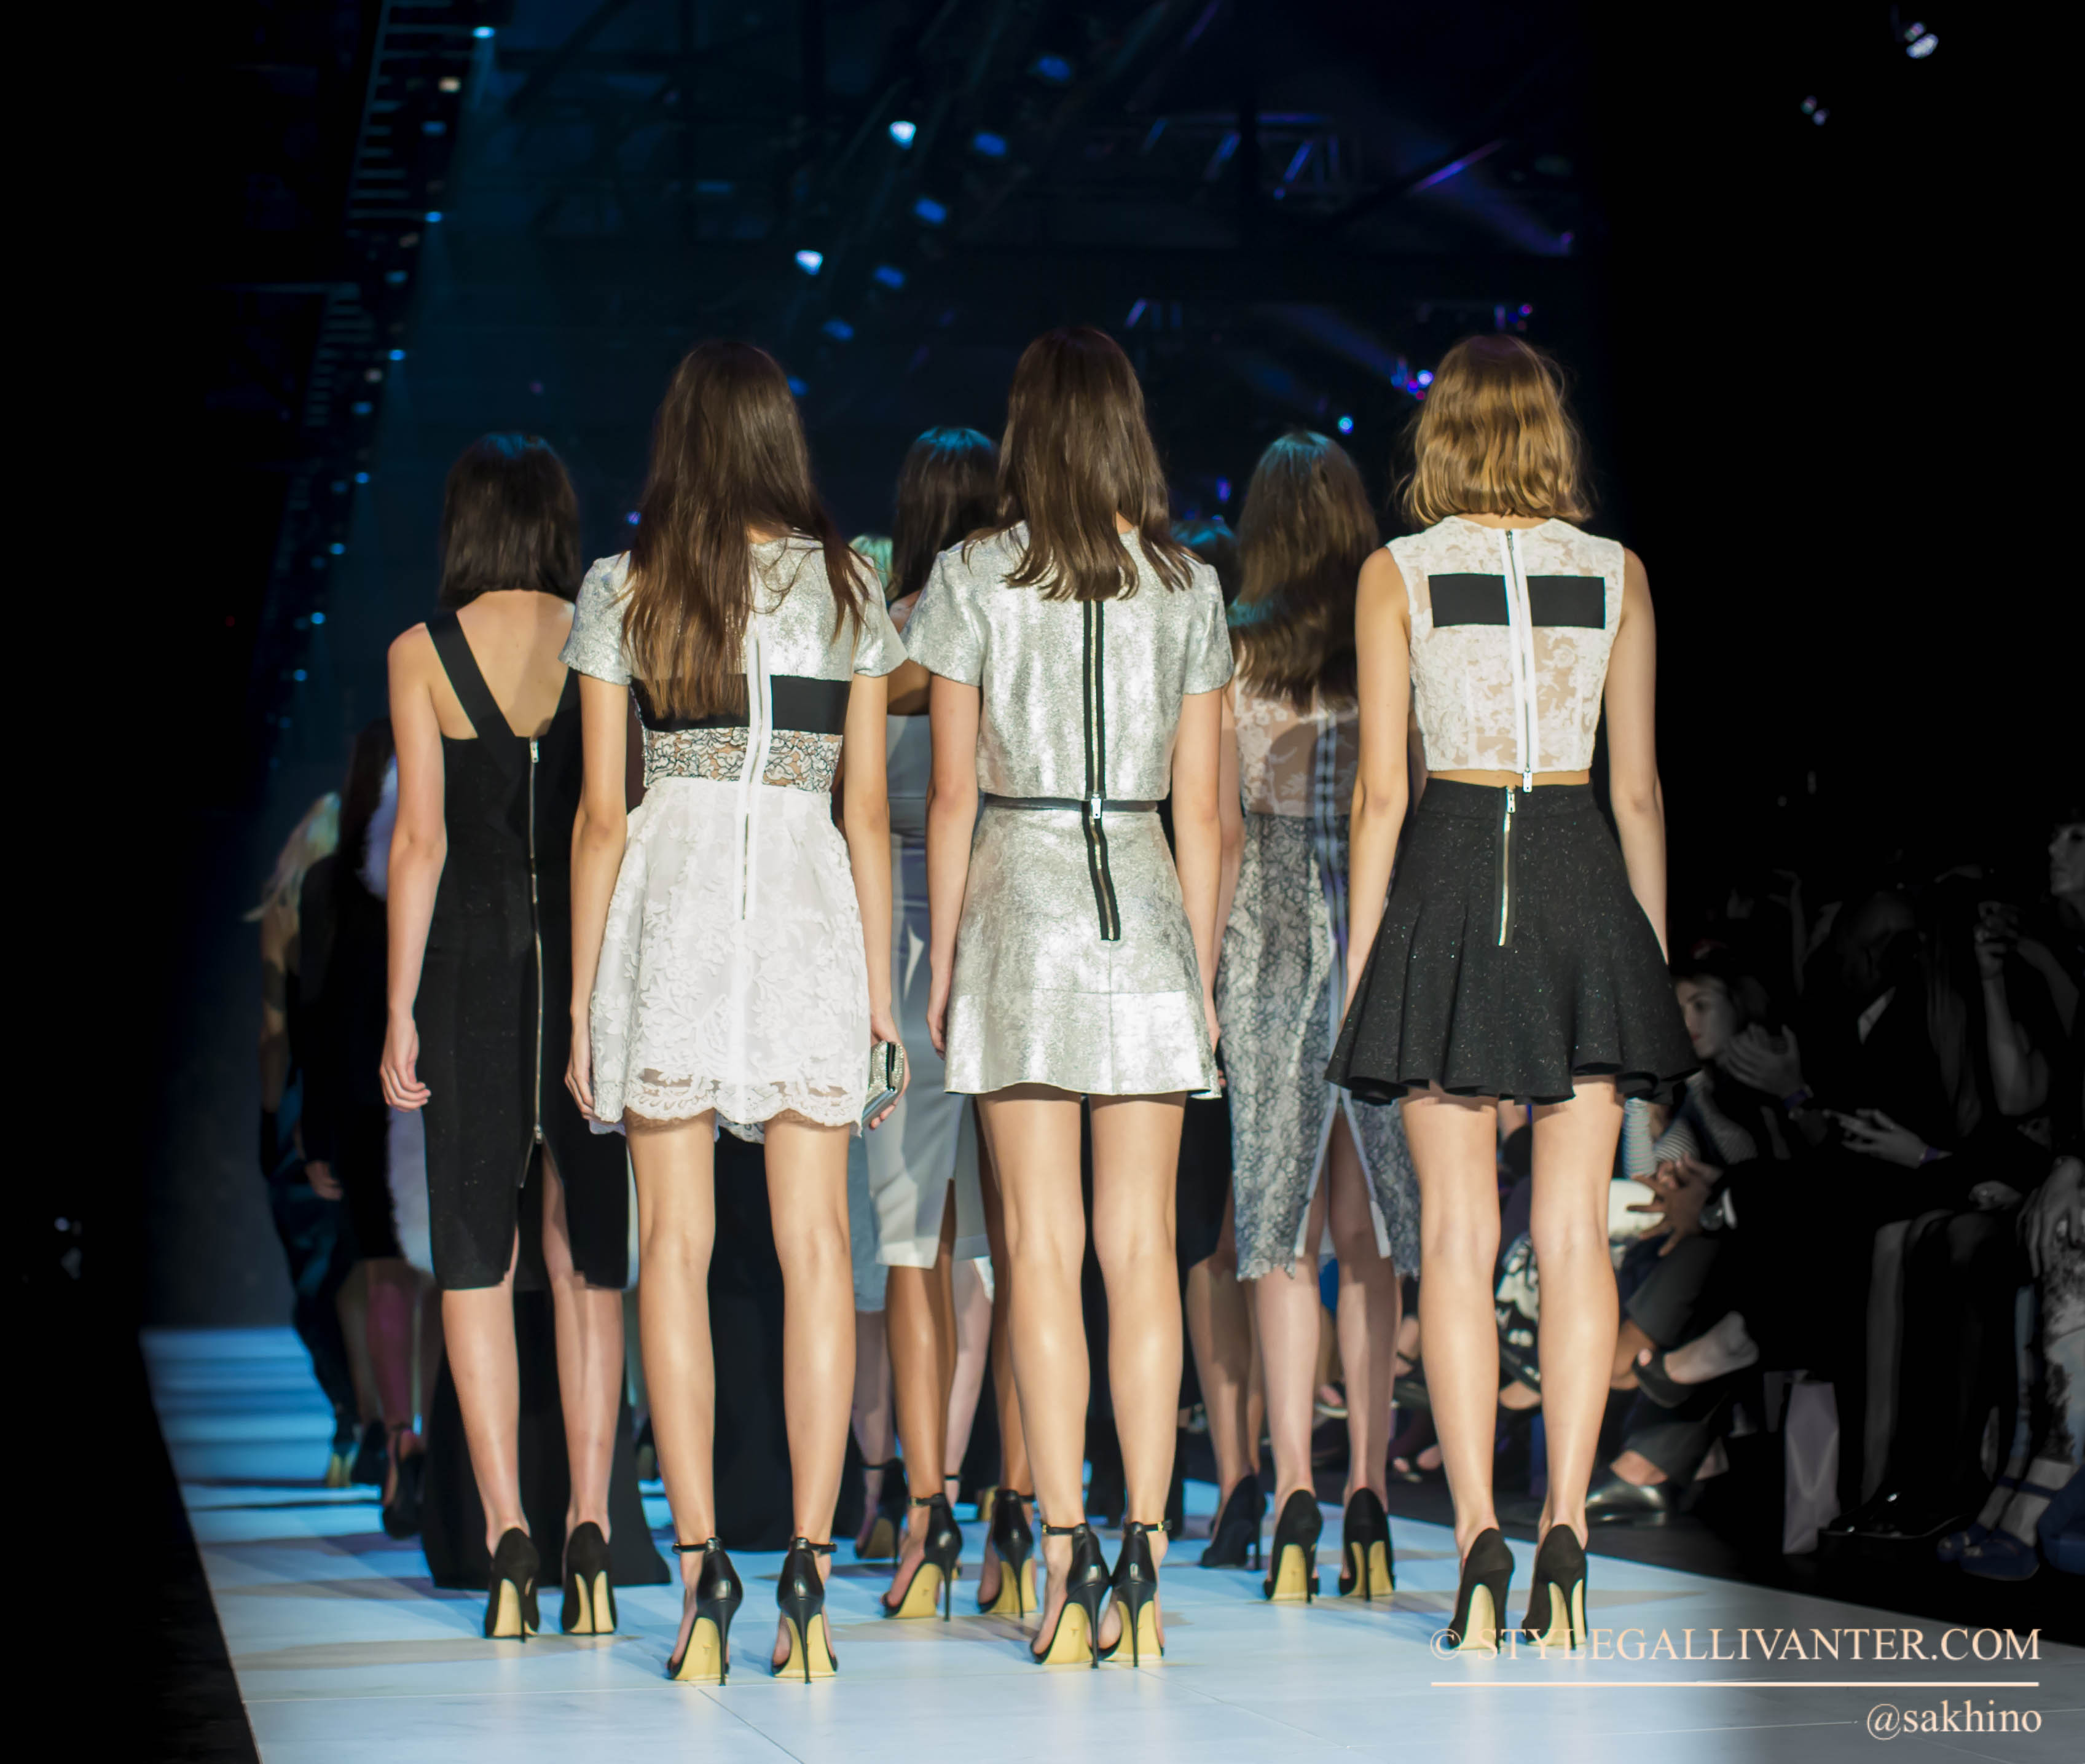 stylegallivanter_VAMFF-2015_VAMFF2015_VAMFF15_MELBOURNE-FASHION-WEEKS-2015_best-dressed-VAMFF-2015_YEOJI-BAE-VAMFF-2015_VAMFF-bloggers-2015_CARLA-ZAMPATTI-2015-VAMFF-11